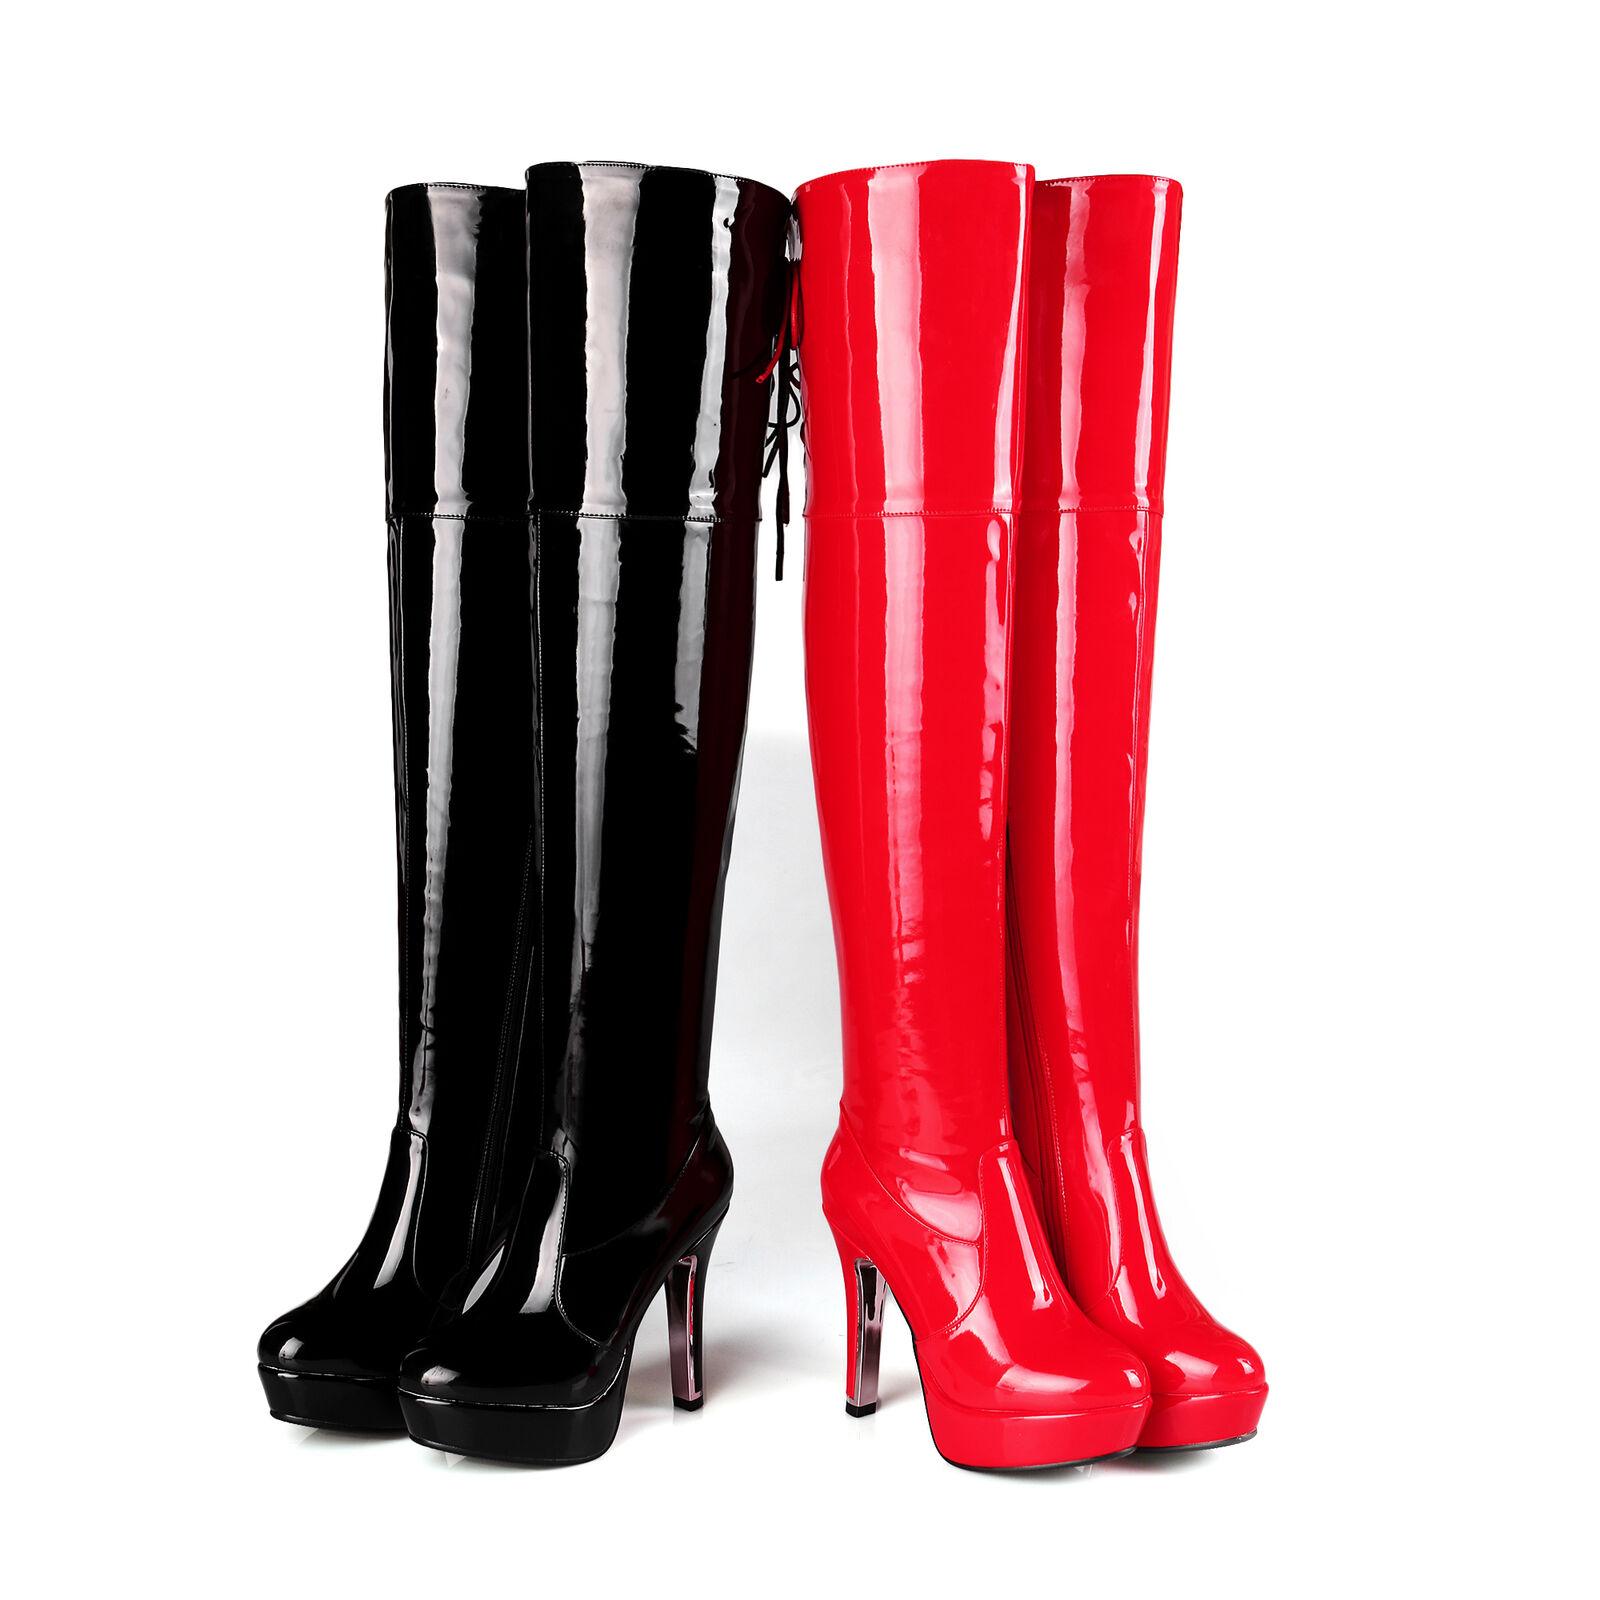 Faux-Lackleder Damenschuhe Overkneestiefel High Heels Platform Gr.34.35-46.47.48 Gr.34.35-46.47.48 Gr.34.35-46.47.48 b40cd5